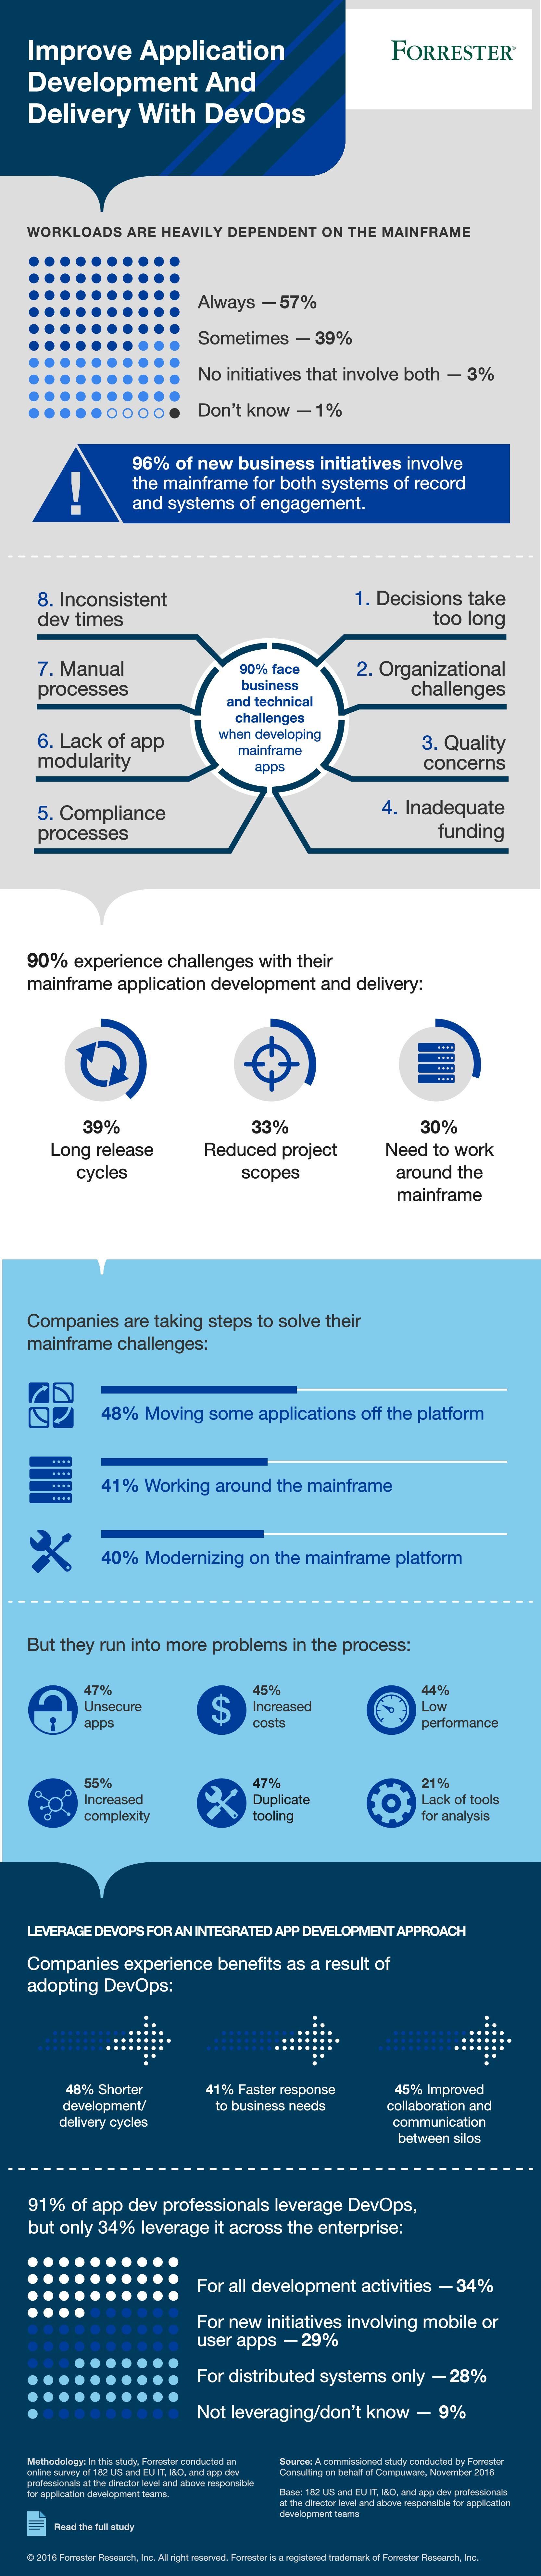 infografik-compuware-mainframe-devops